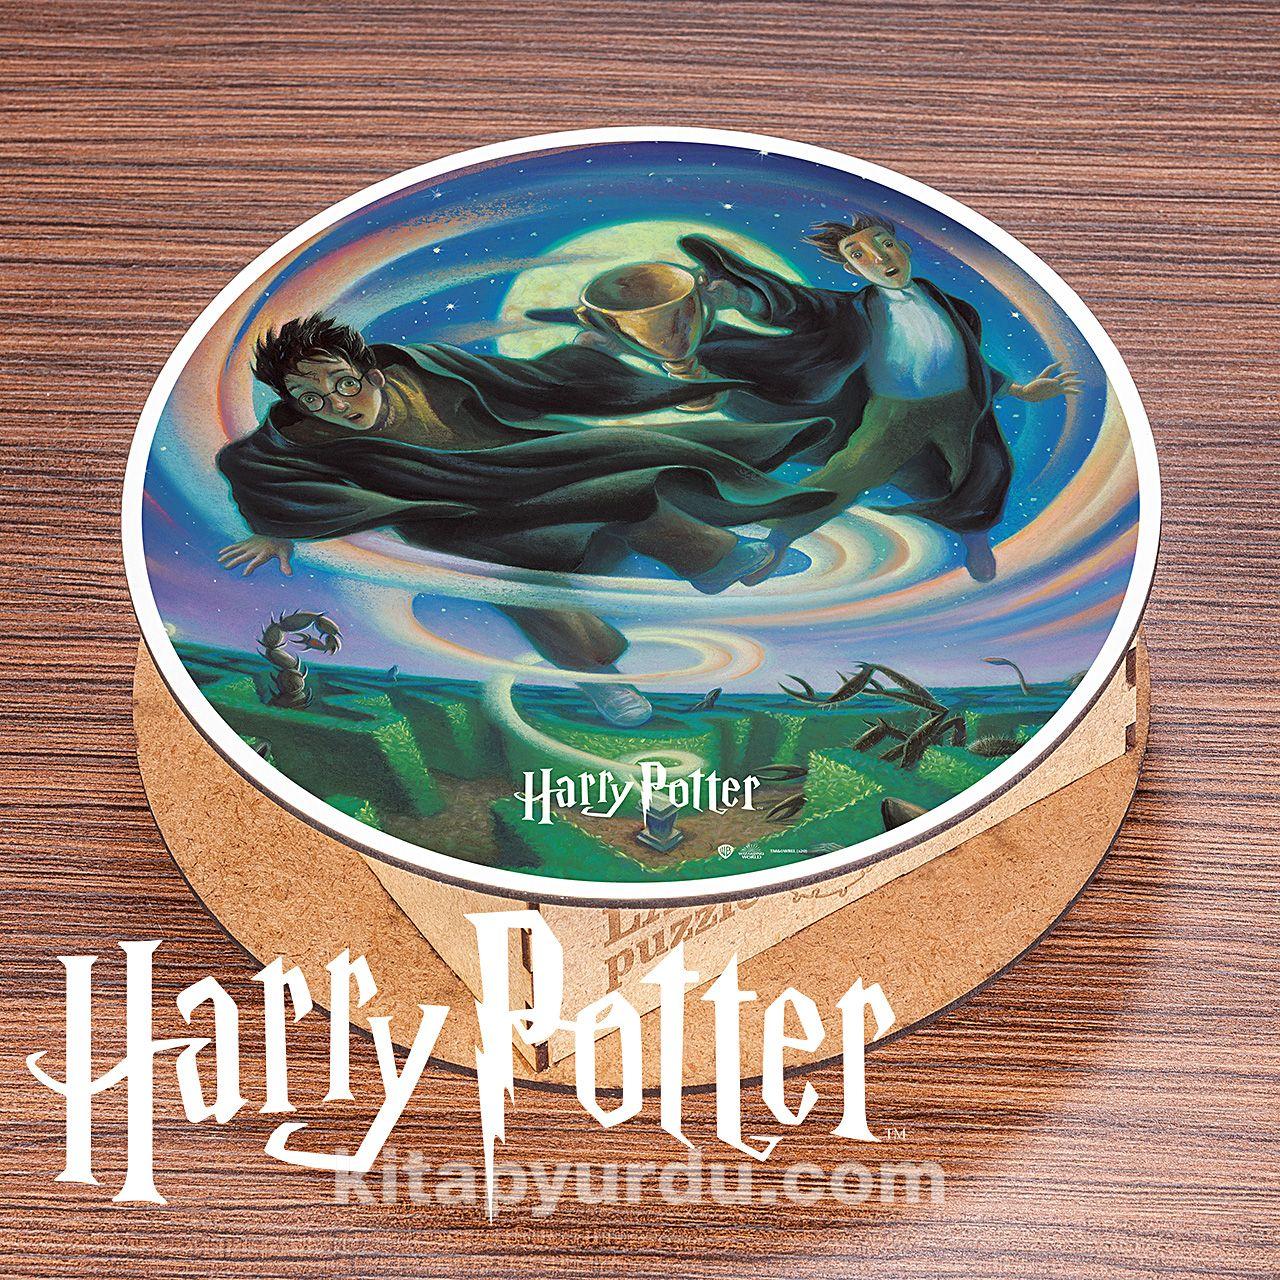 Harry Potter - Goblet of Fire Ahşap Lava Puzzle 300 Parça (KOP-HP267 - CCC) (Lisanslı Ürün) PDF Kitap İndir